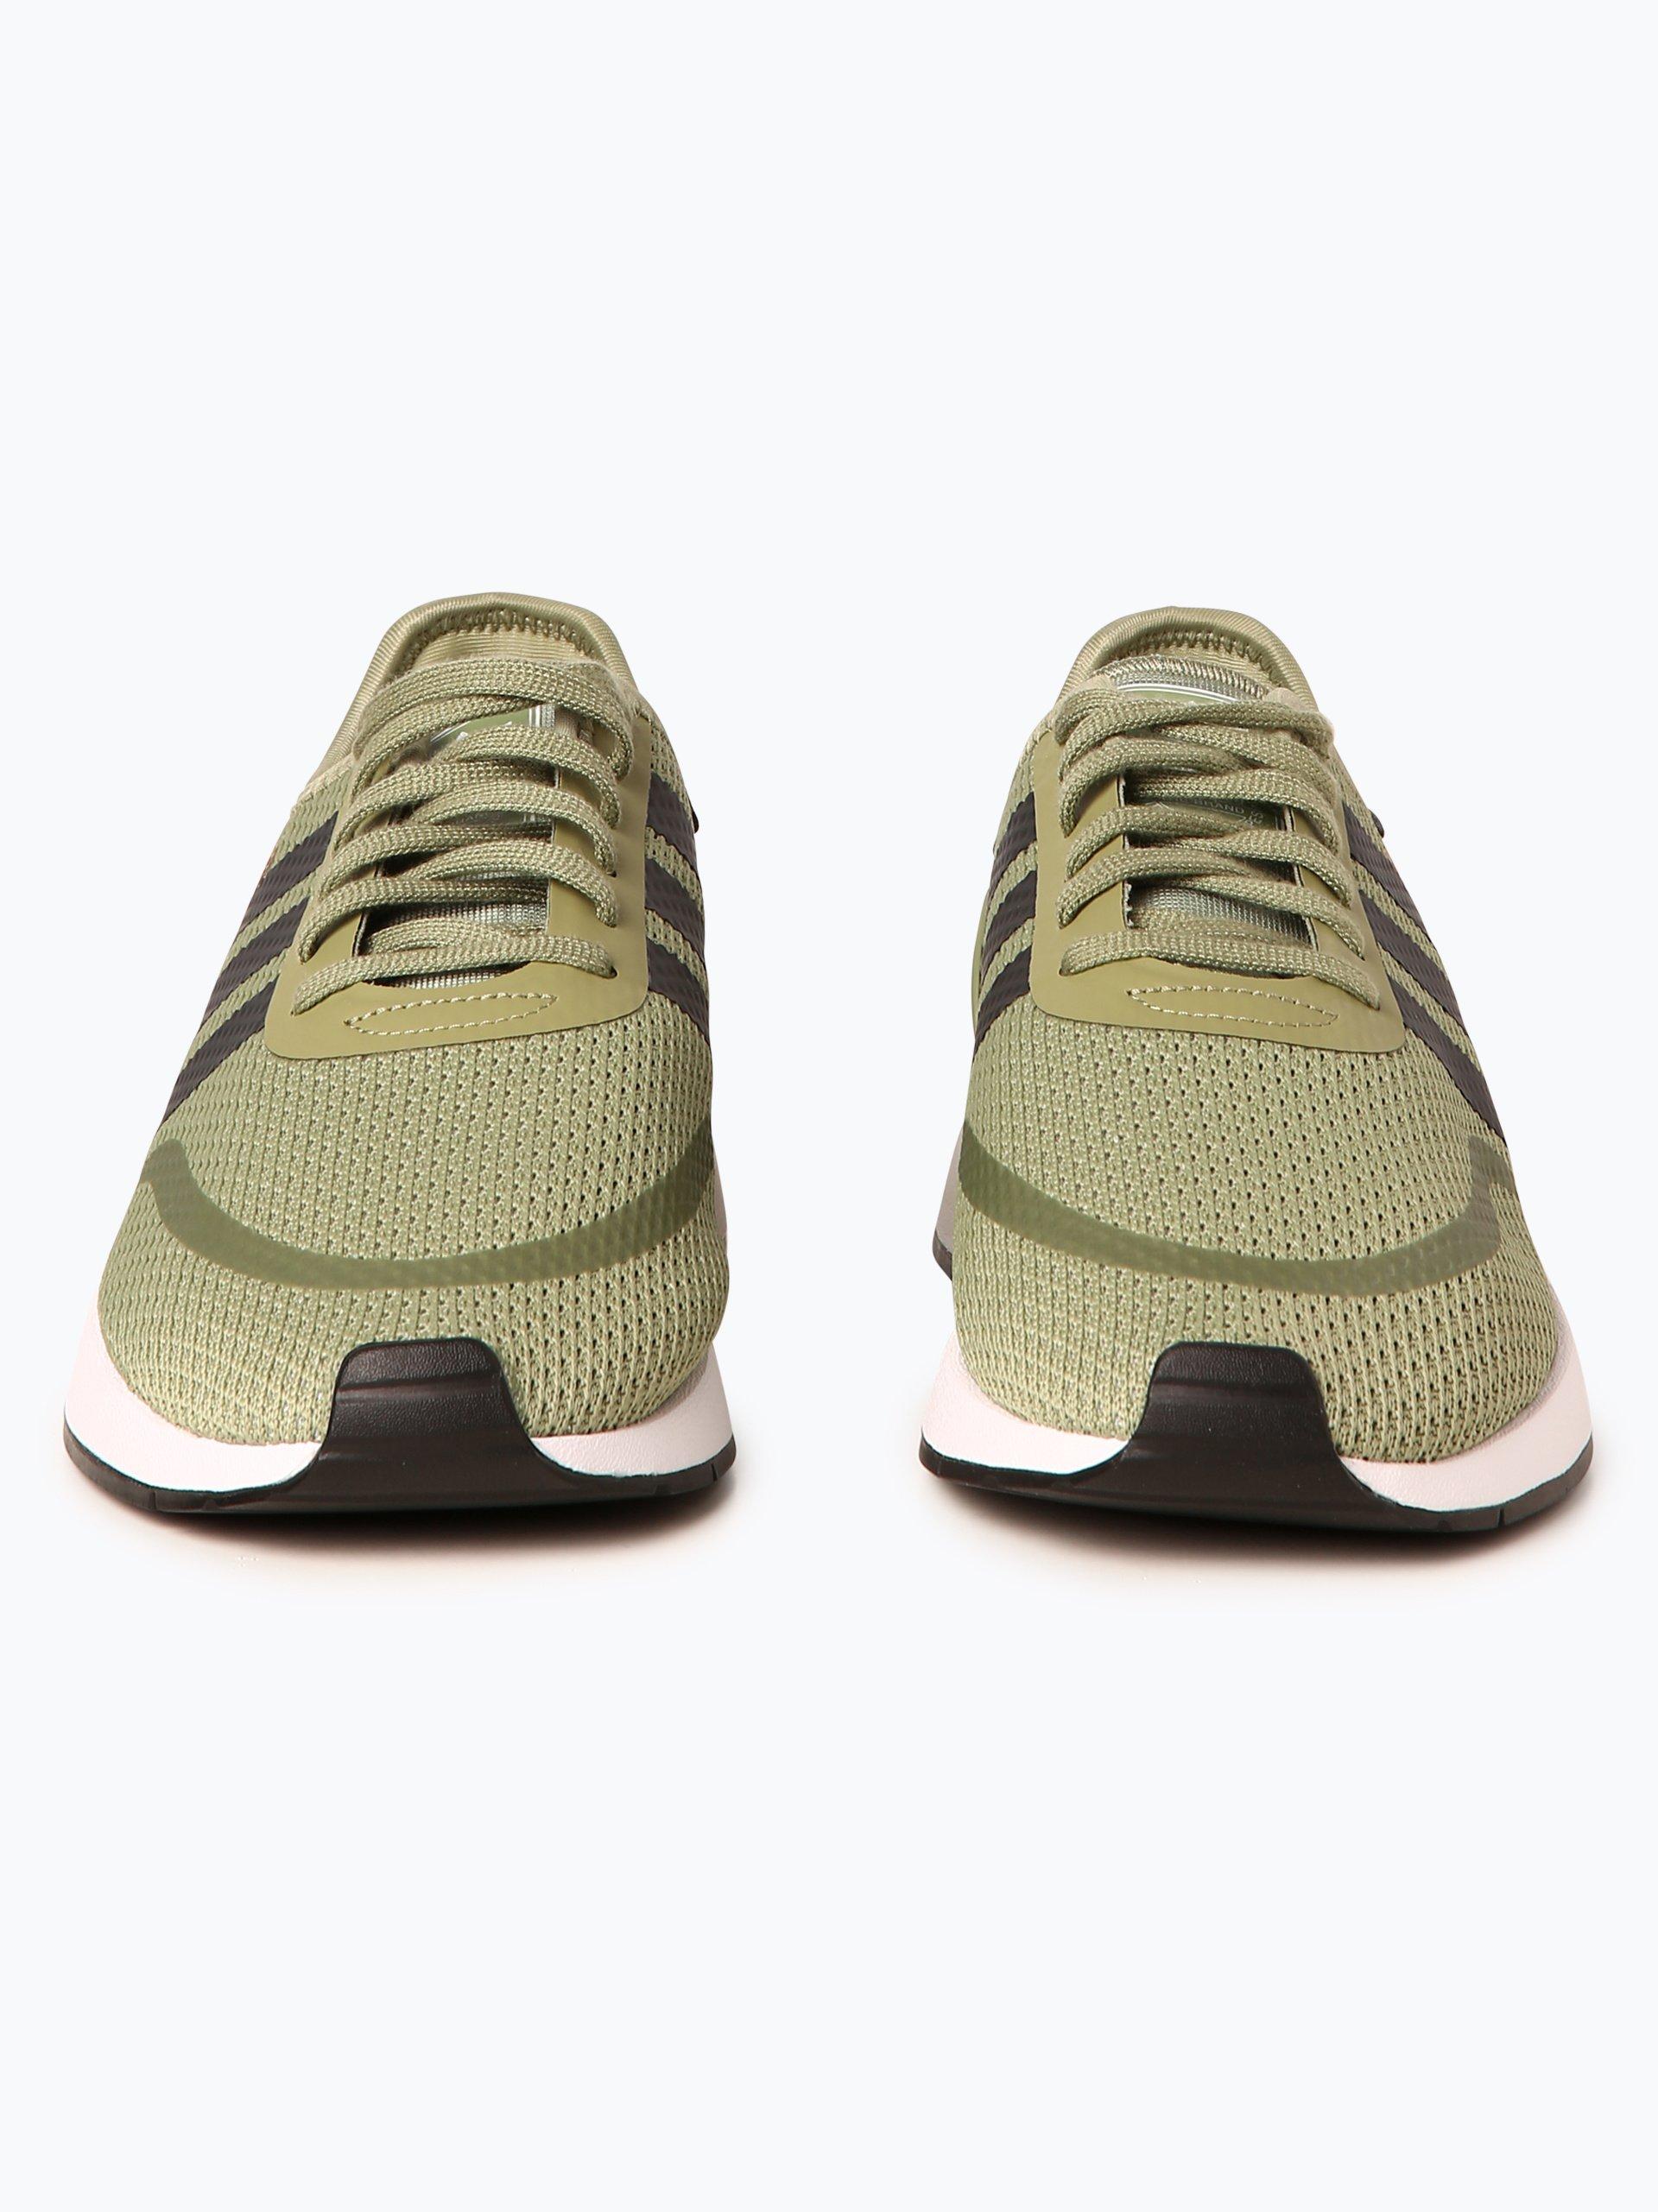 adidas Originals Tenisówki męskie – N-5923